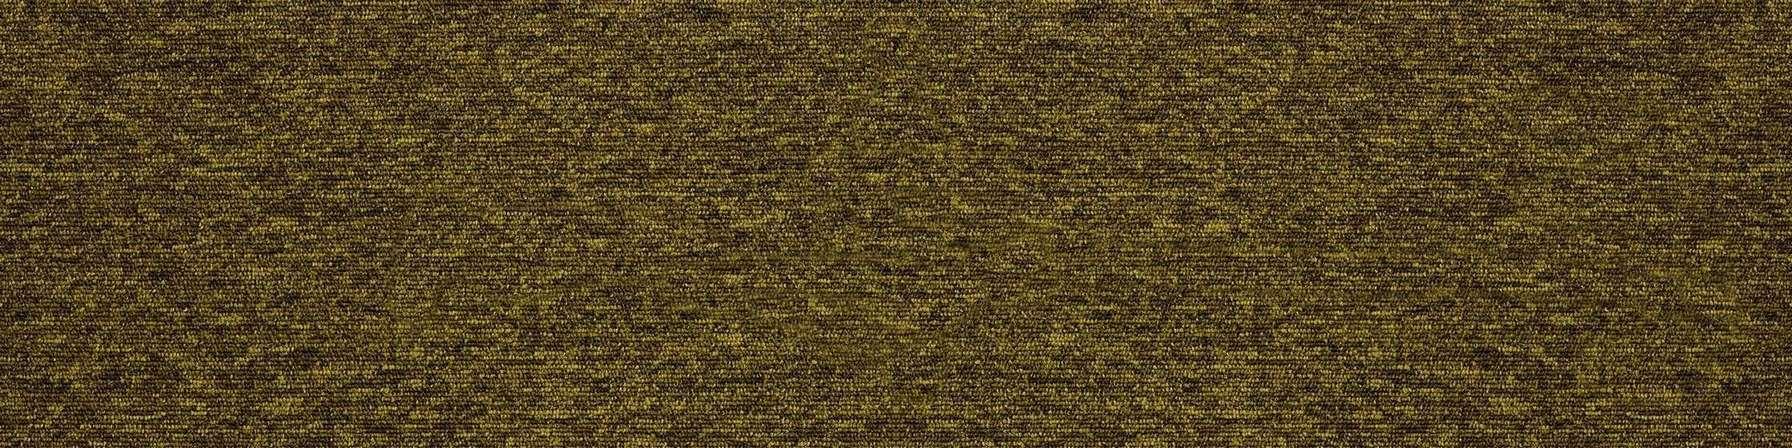 tivoli 21106 green turtle carpet plank